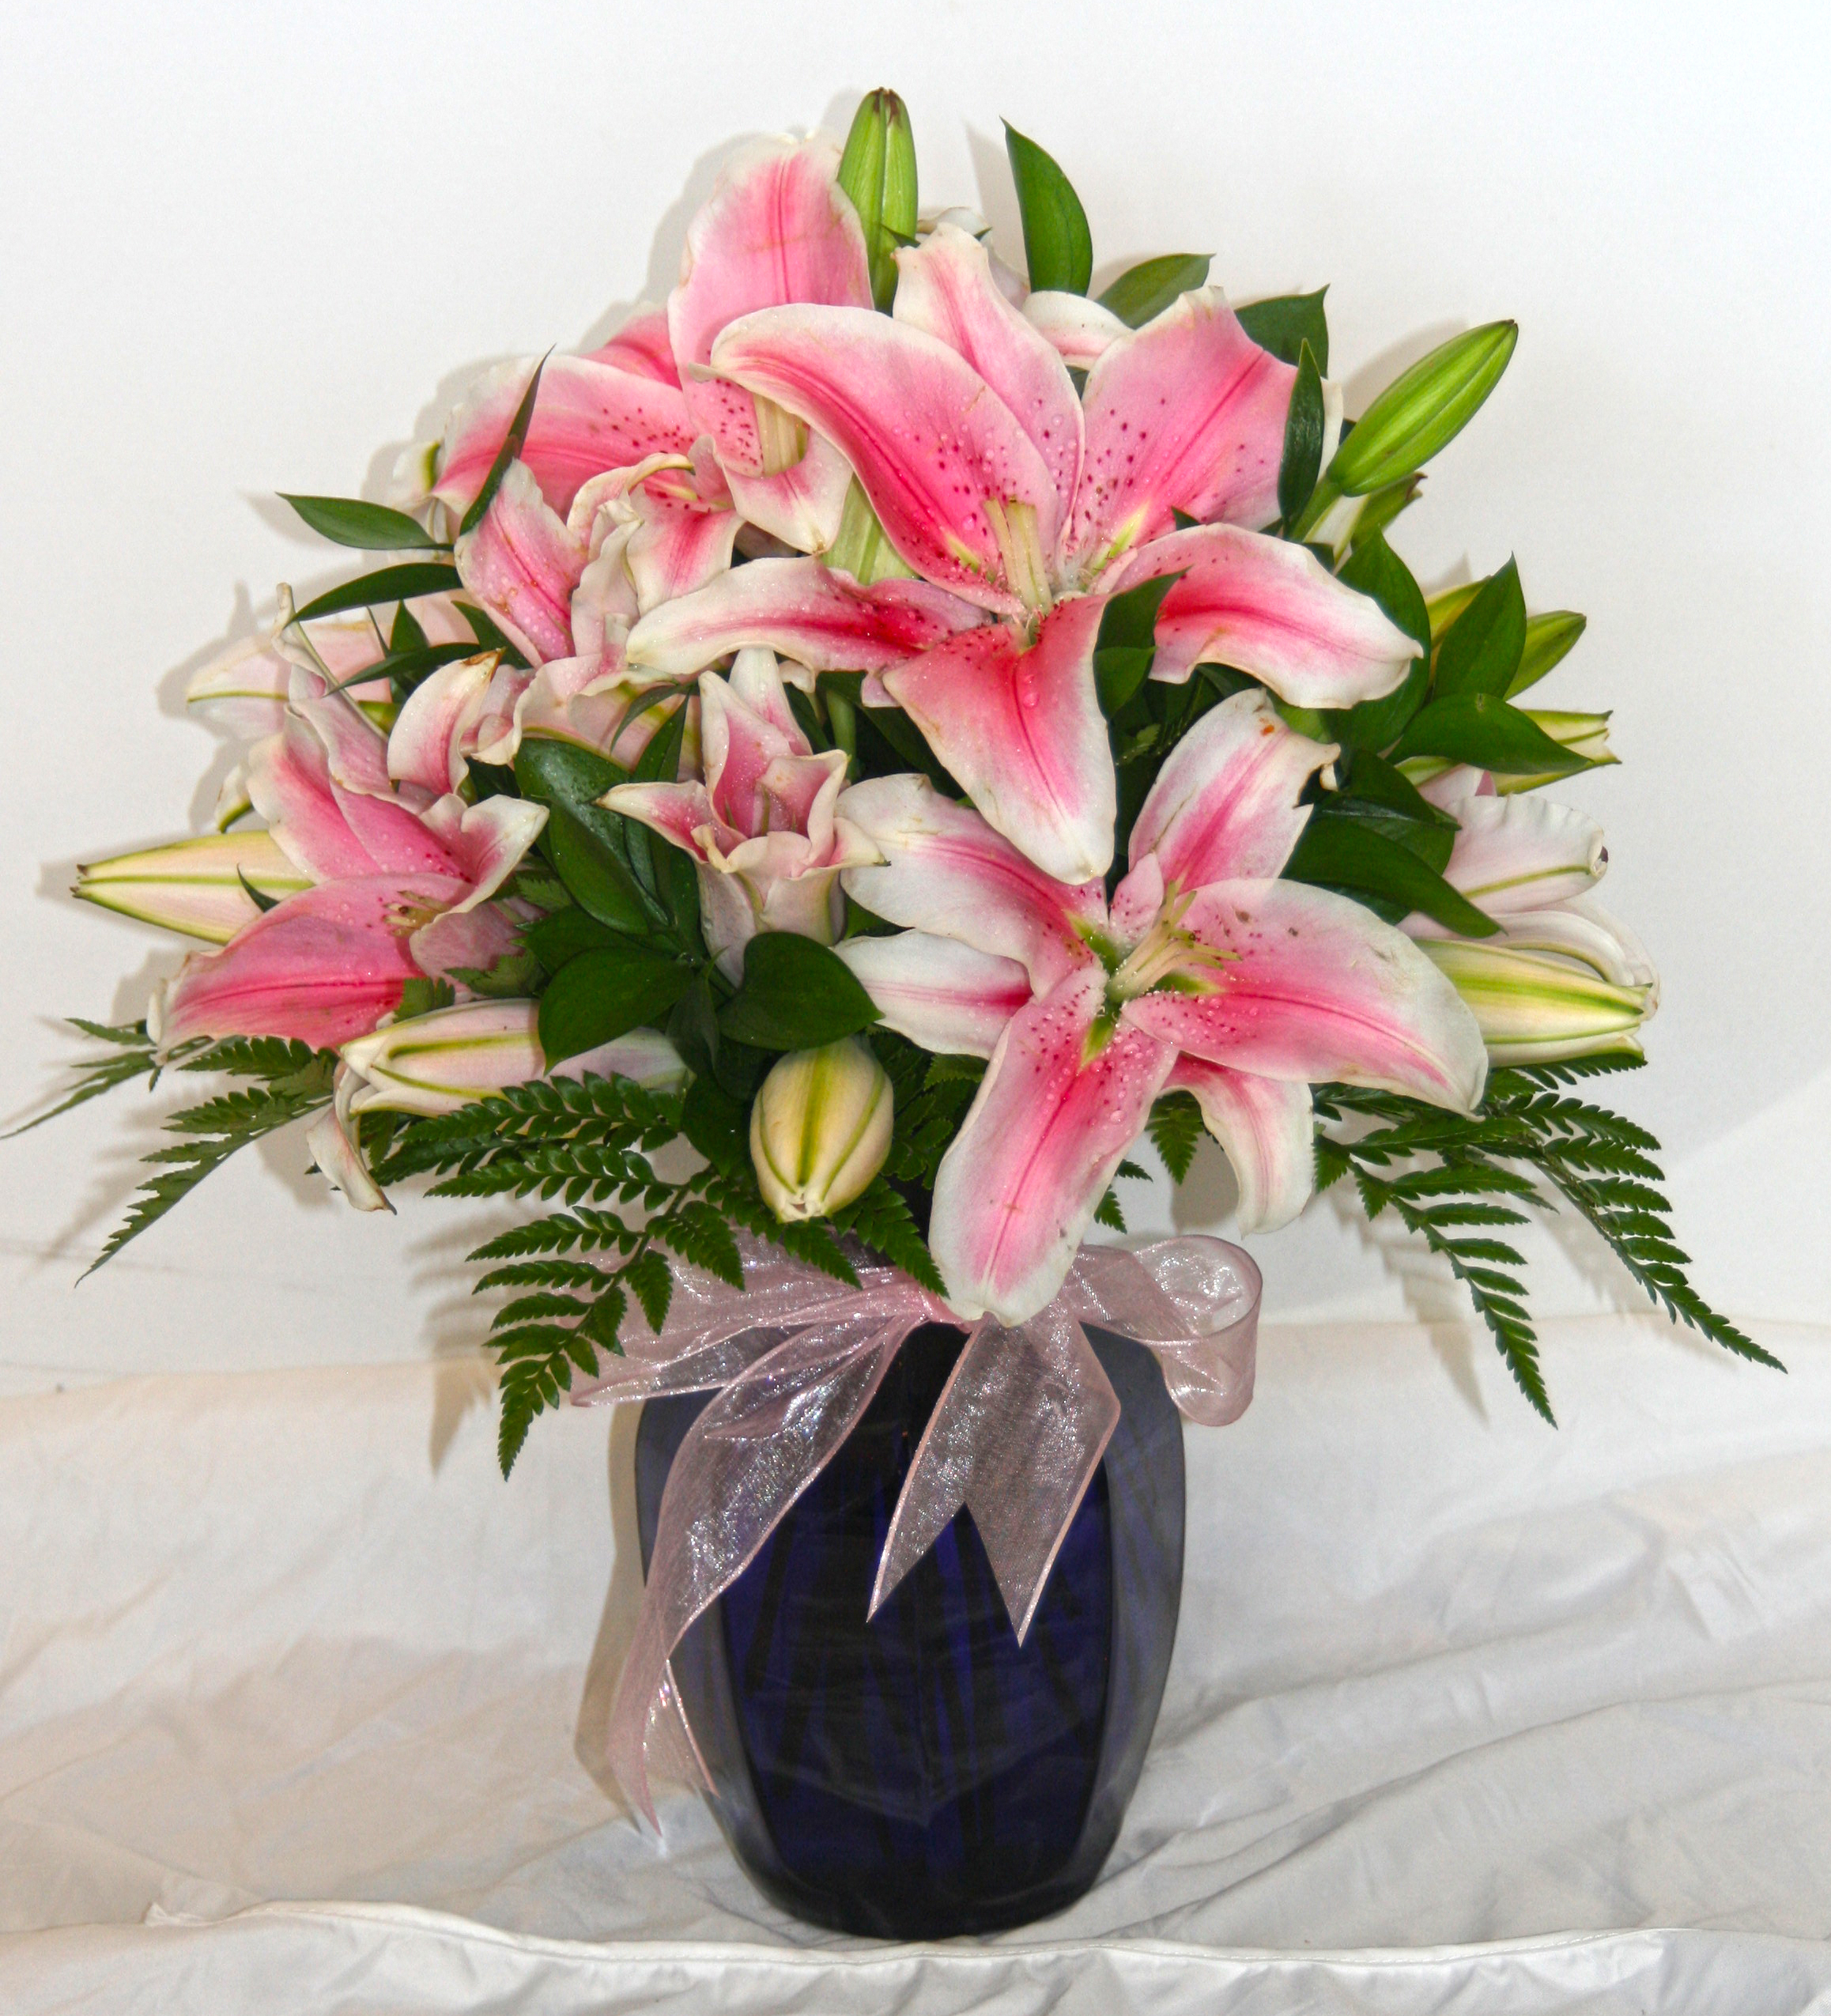 Sarasota Enchanted Flowers 8419 S Tamiami Trl Sarasota Fl 34238